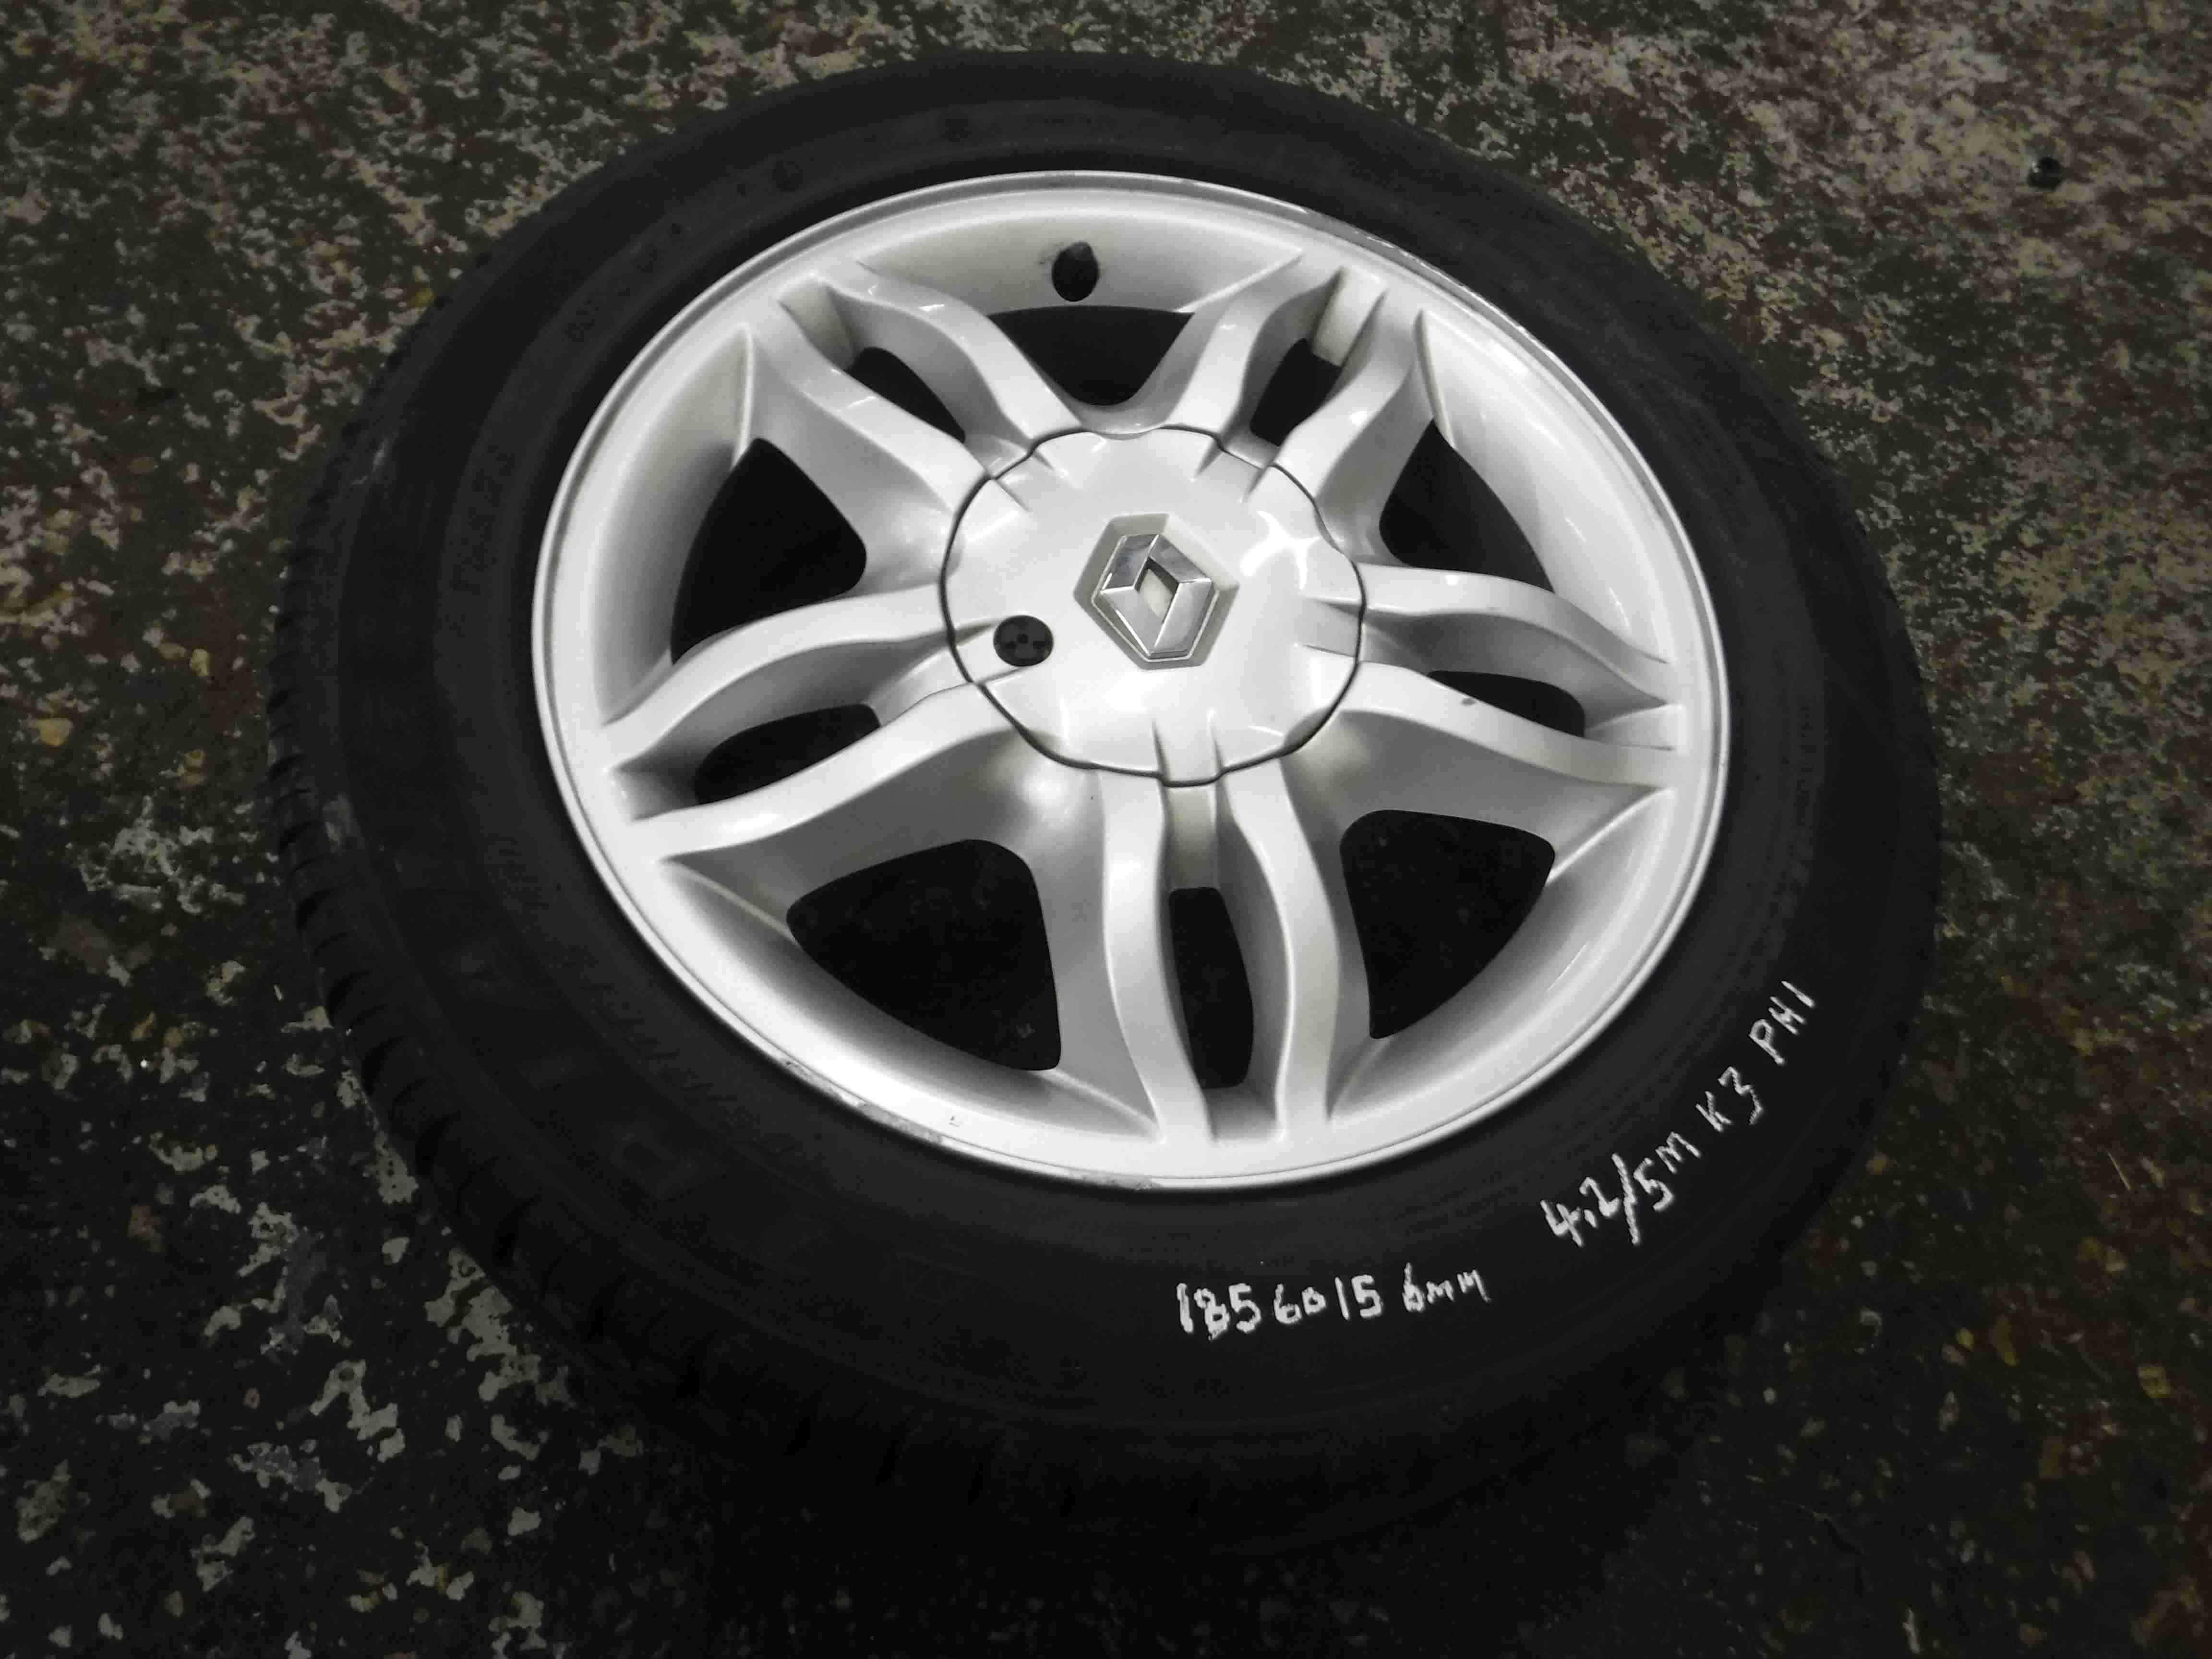 Renault Clio MK3 2005-2009 Mahonia Alloy Wheel  Tyre 185 60 15 6mm Tread 45